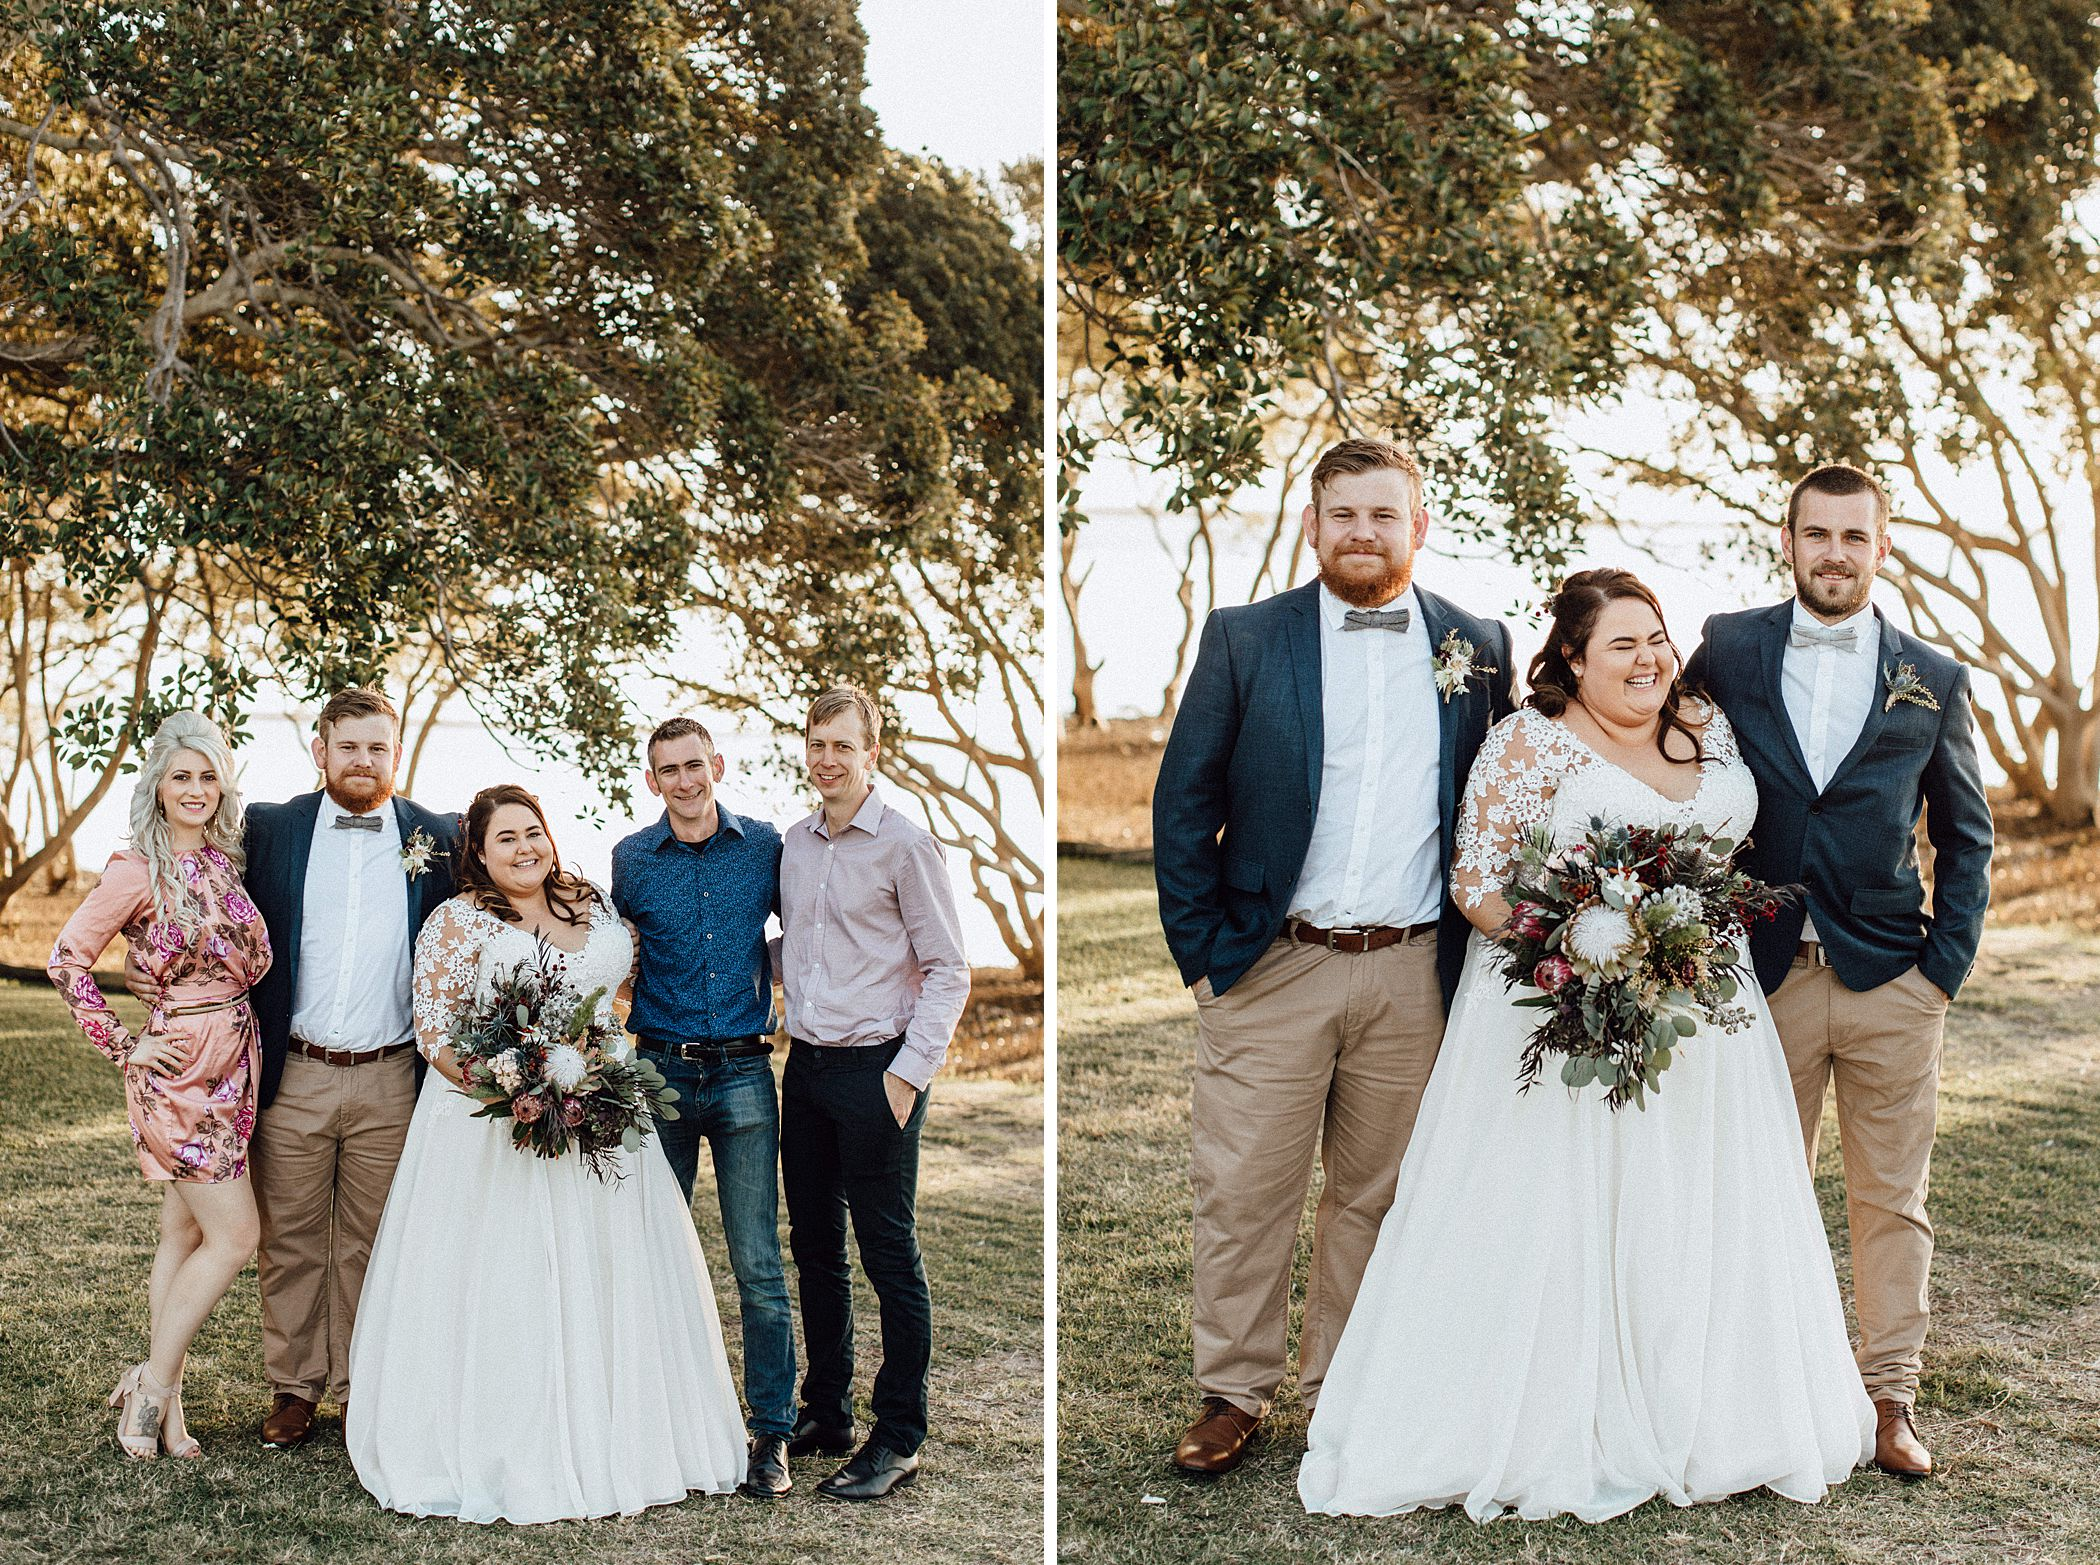 lauren-anne-photography-newcastle-hunter-valley-wedding-photographer_1201.jpg